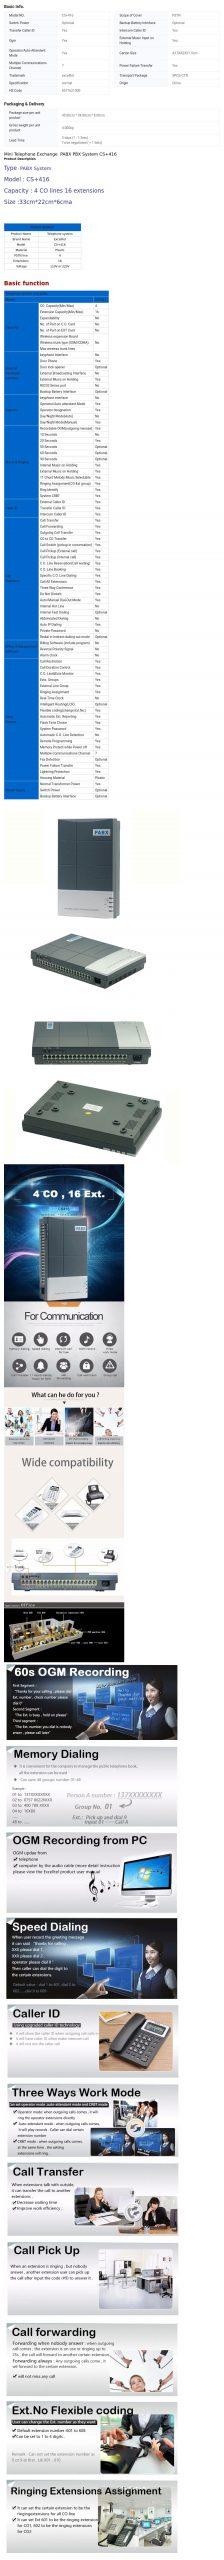 Excelltel PABX System 4Co Line 16 Extension